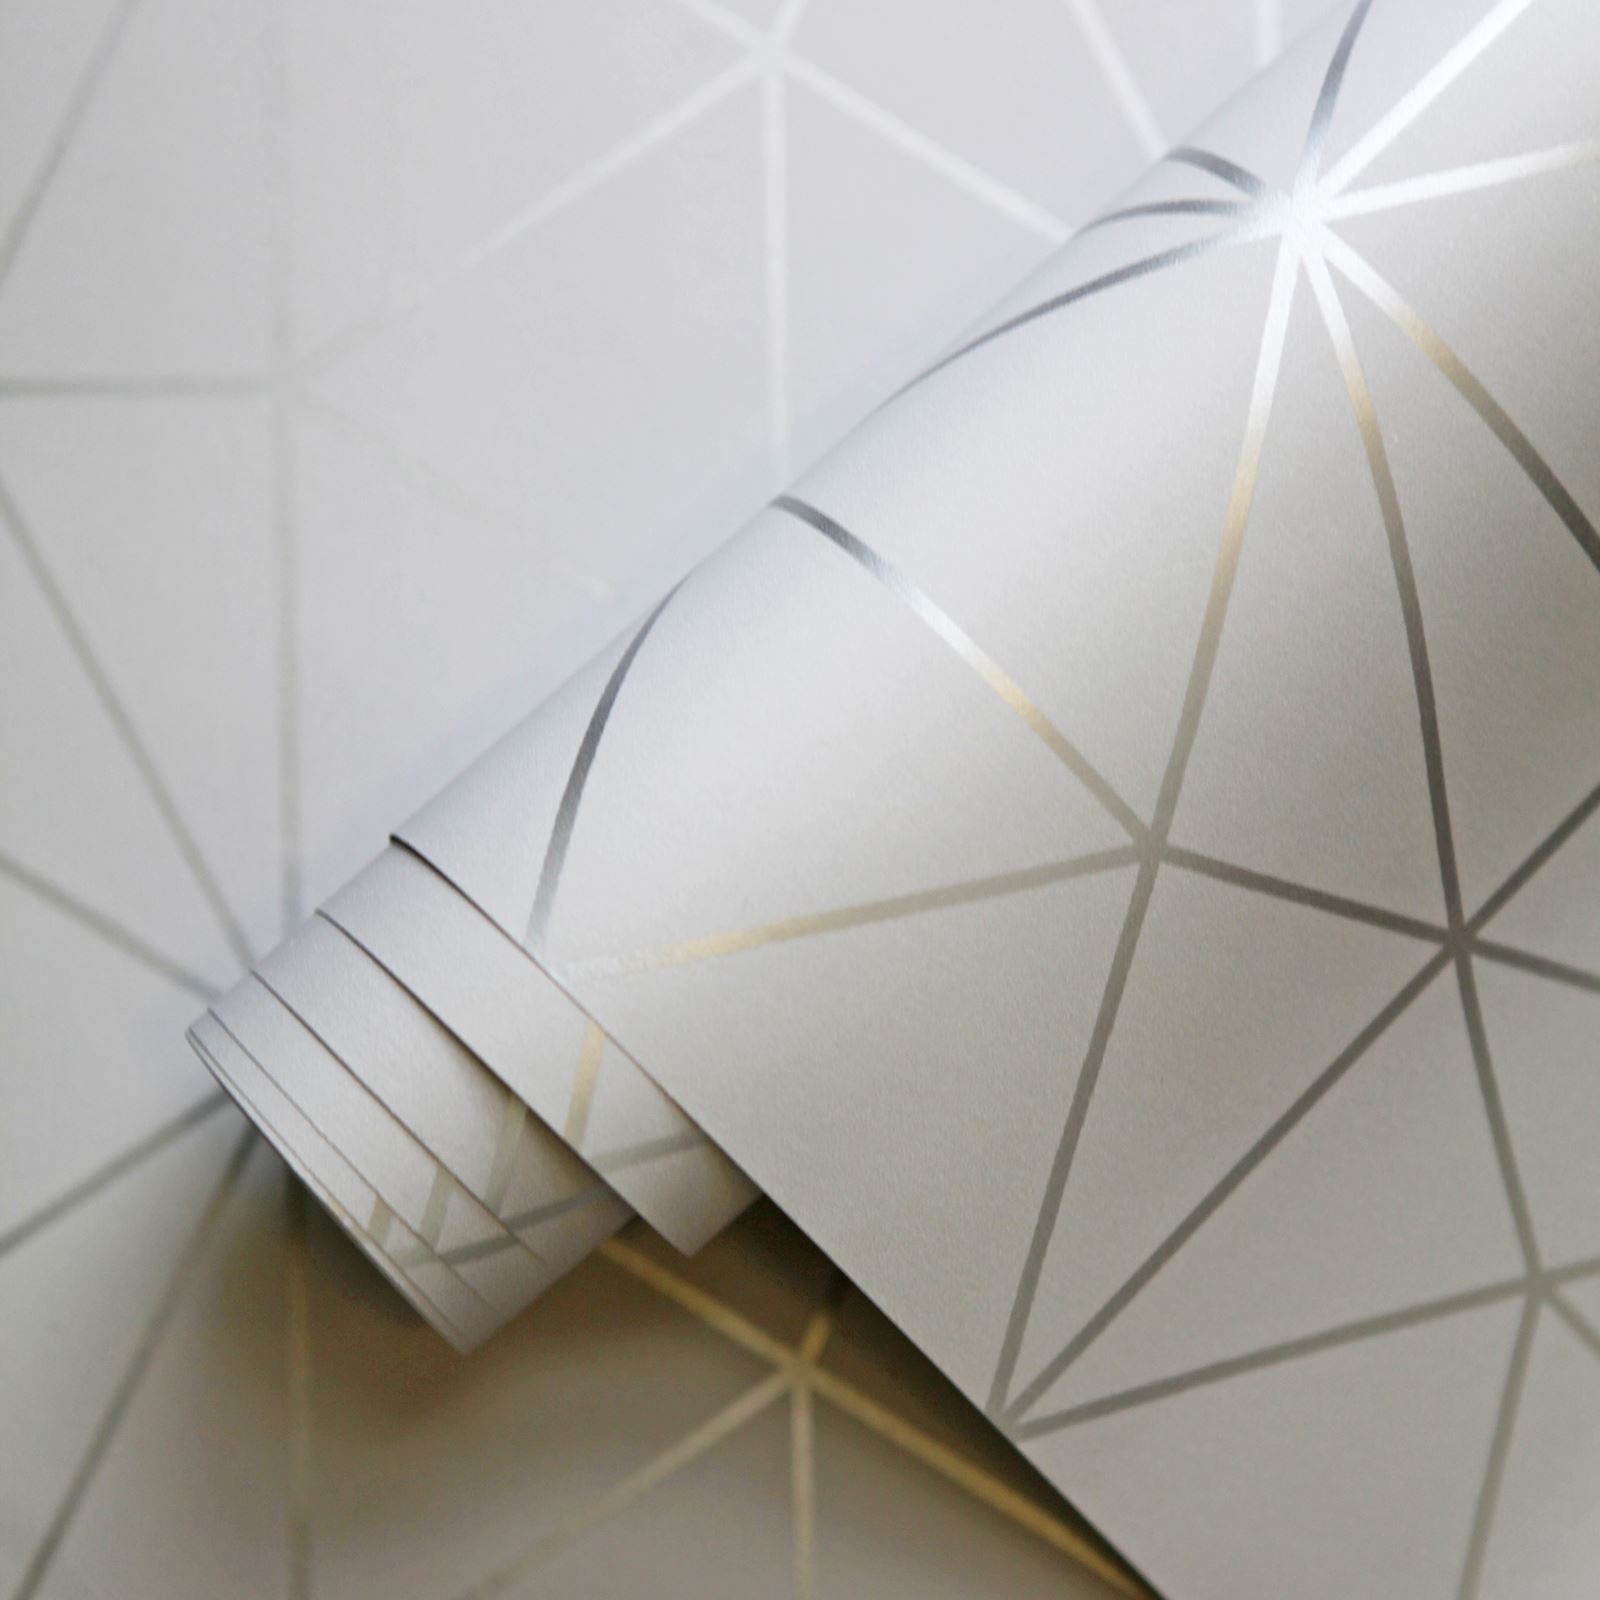 WORLD-OF-WALLPAPER-METRO-PRISM-TRIANGLE-GEOMETRIC-METALLIC-ROSE-GOLD-COPPER thumbnail 16